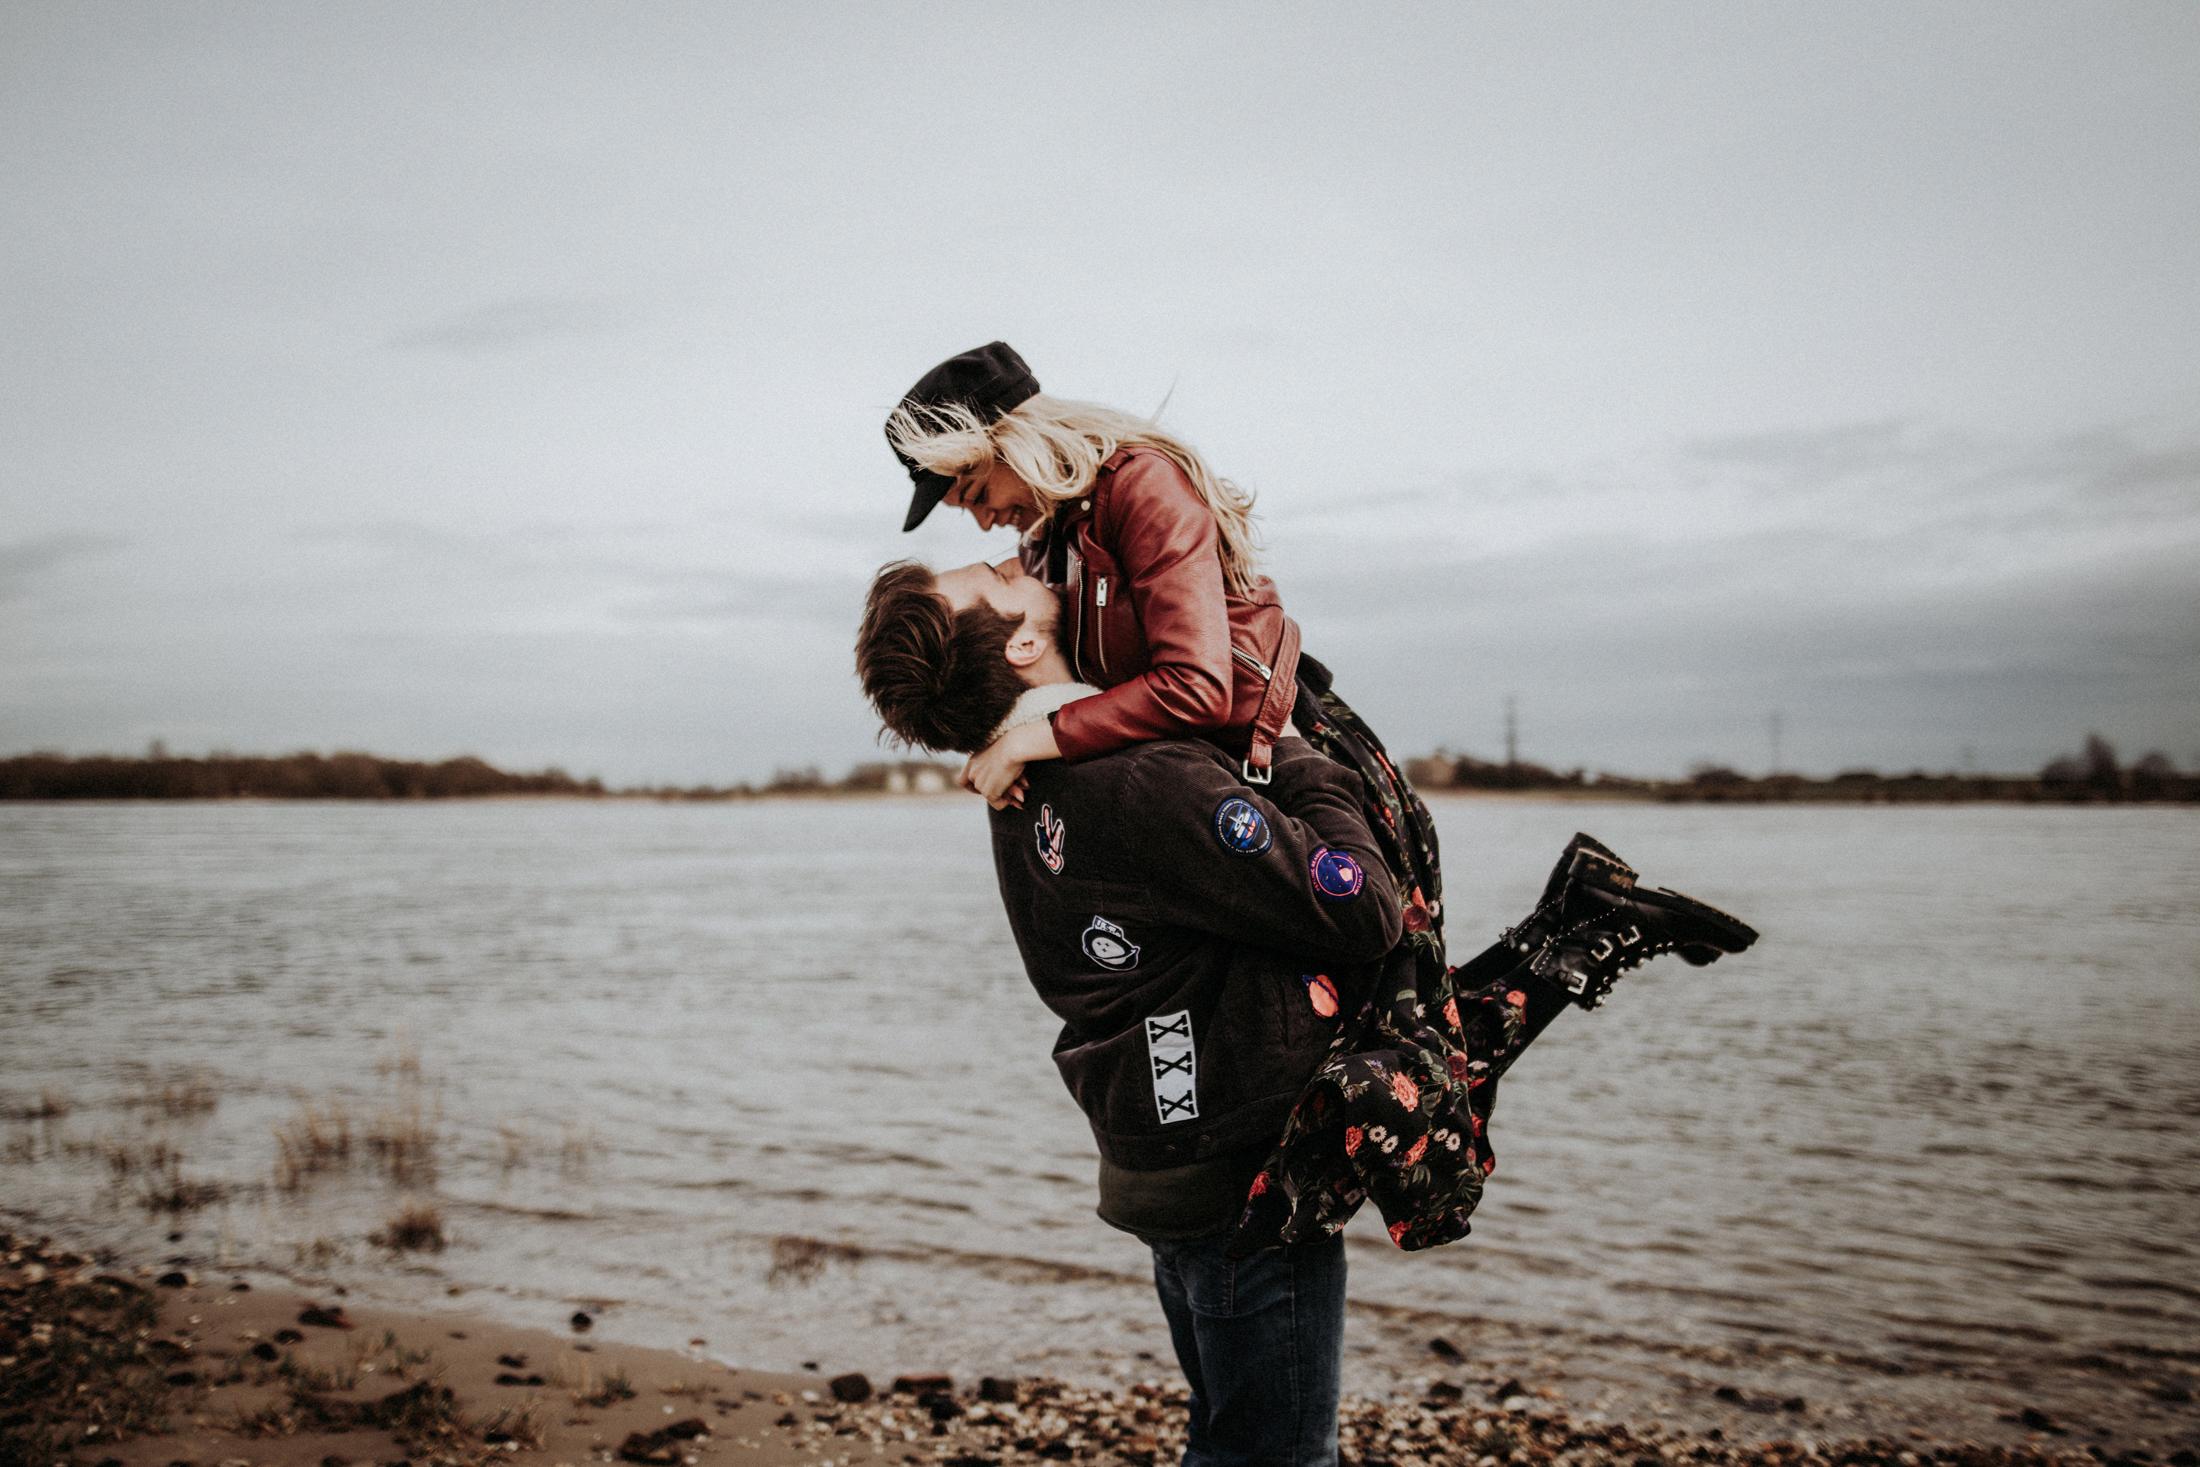 Wedding_Photographer_Mallorca_DanielaMarquardt_Photography_CanaryIslands_Lanzarote_Iceland_Tuscany_Santorini_Portugal_NewYork_Spain_Elopement_Hochzeitsfotograf_CK119